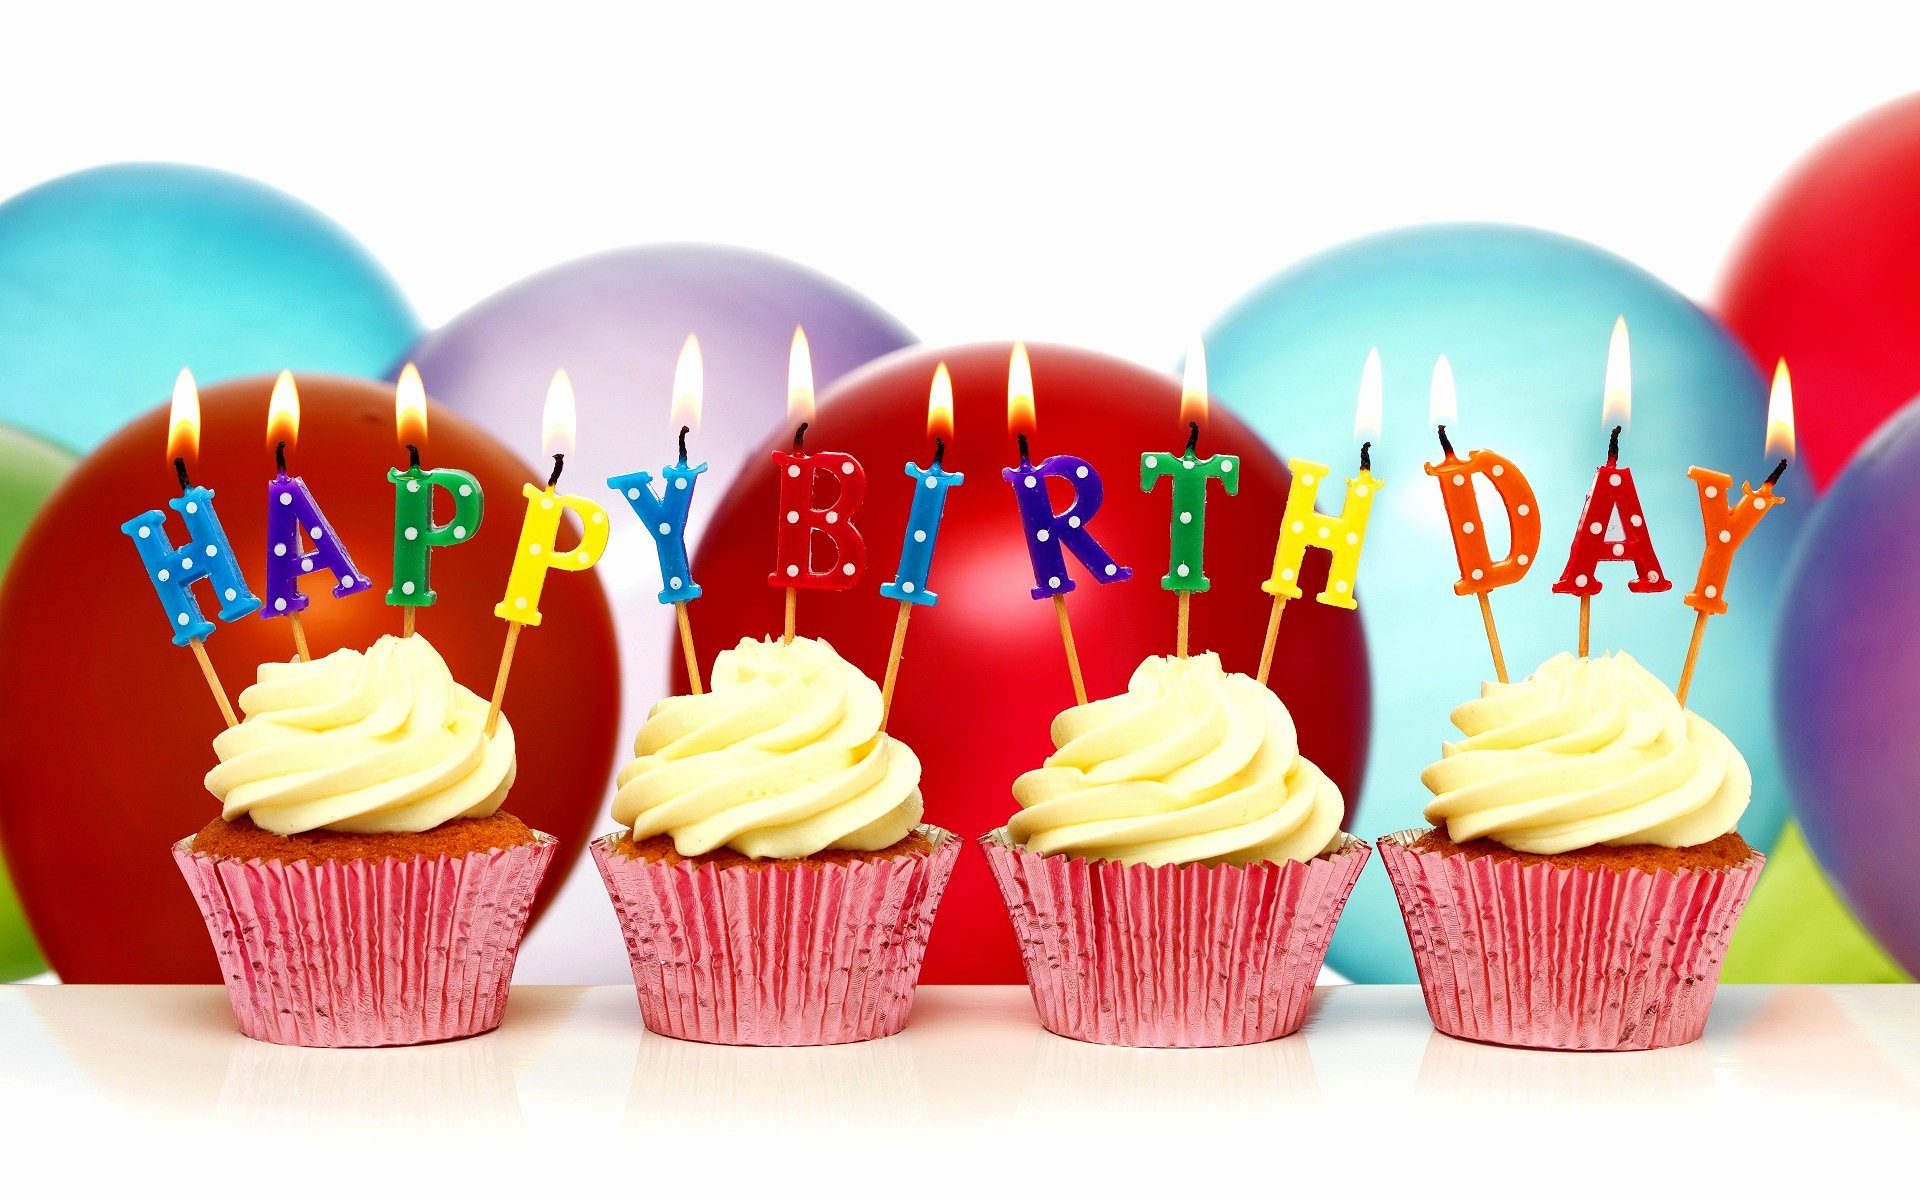 Happy Bday Wallpapers Free Unique Happy Birthday Cake